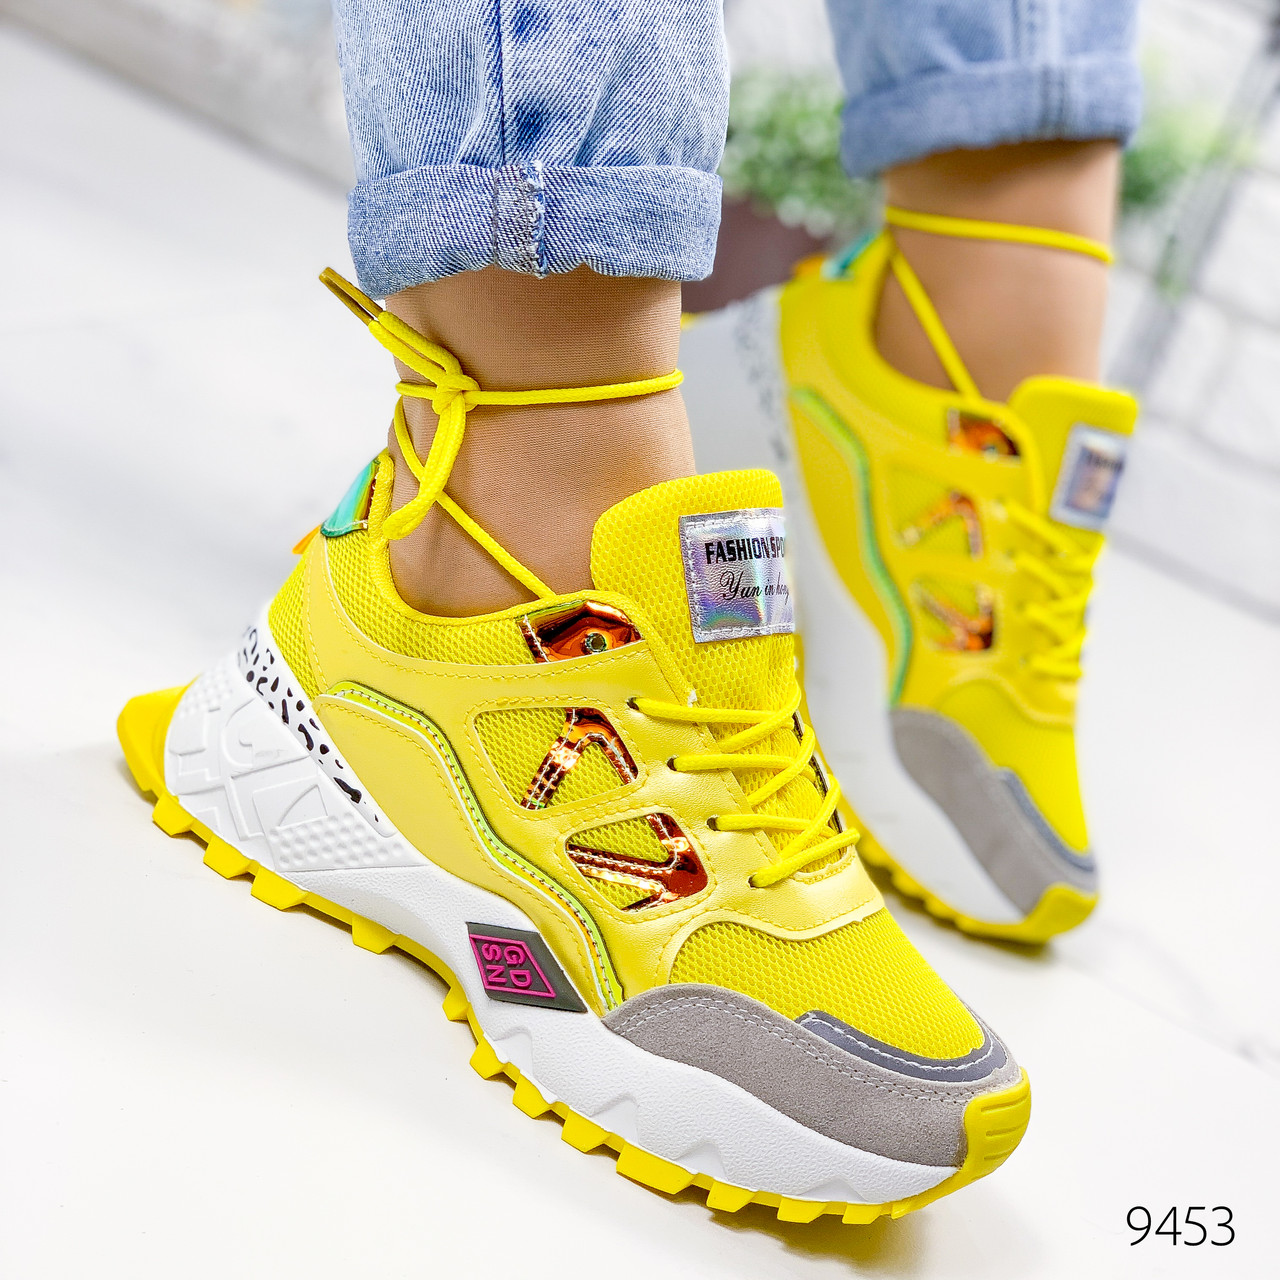 Кроссовки женские Cherilh желтый + голографик 9453